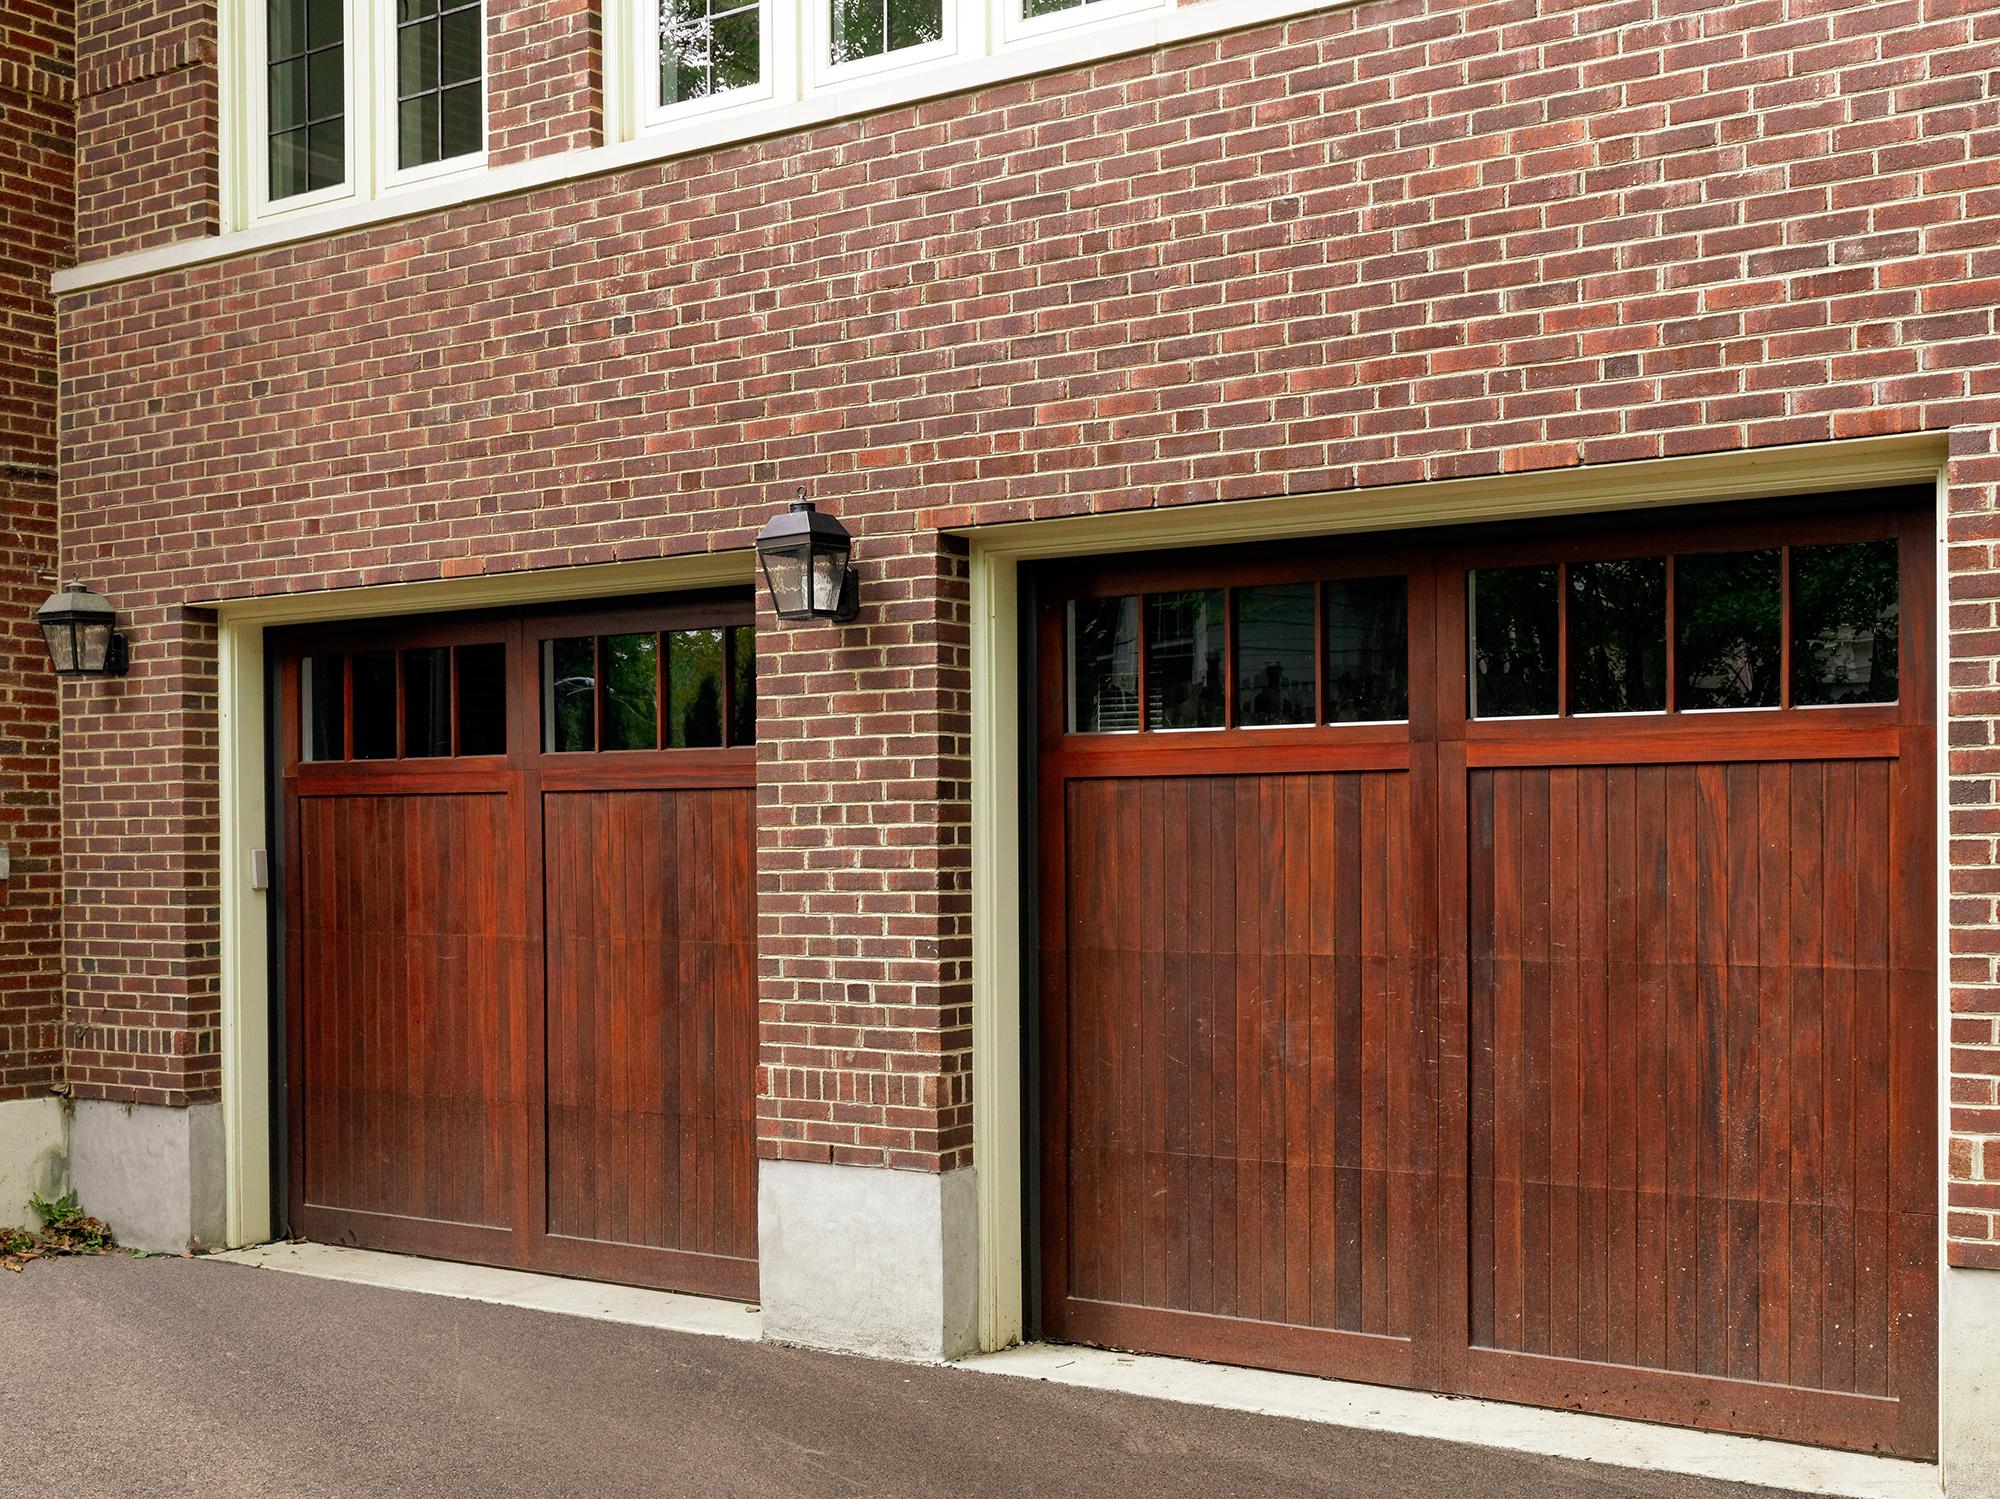 Detail of garage doors after remodel